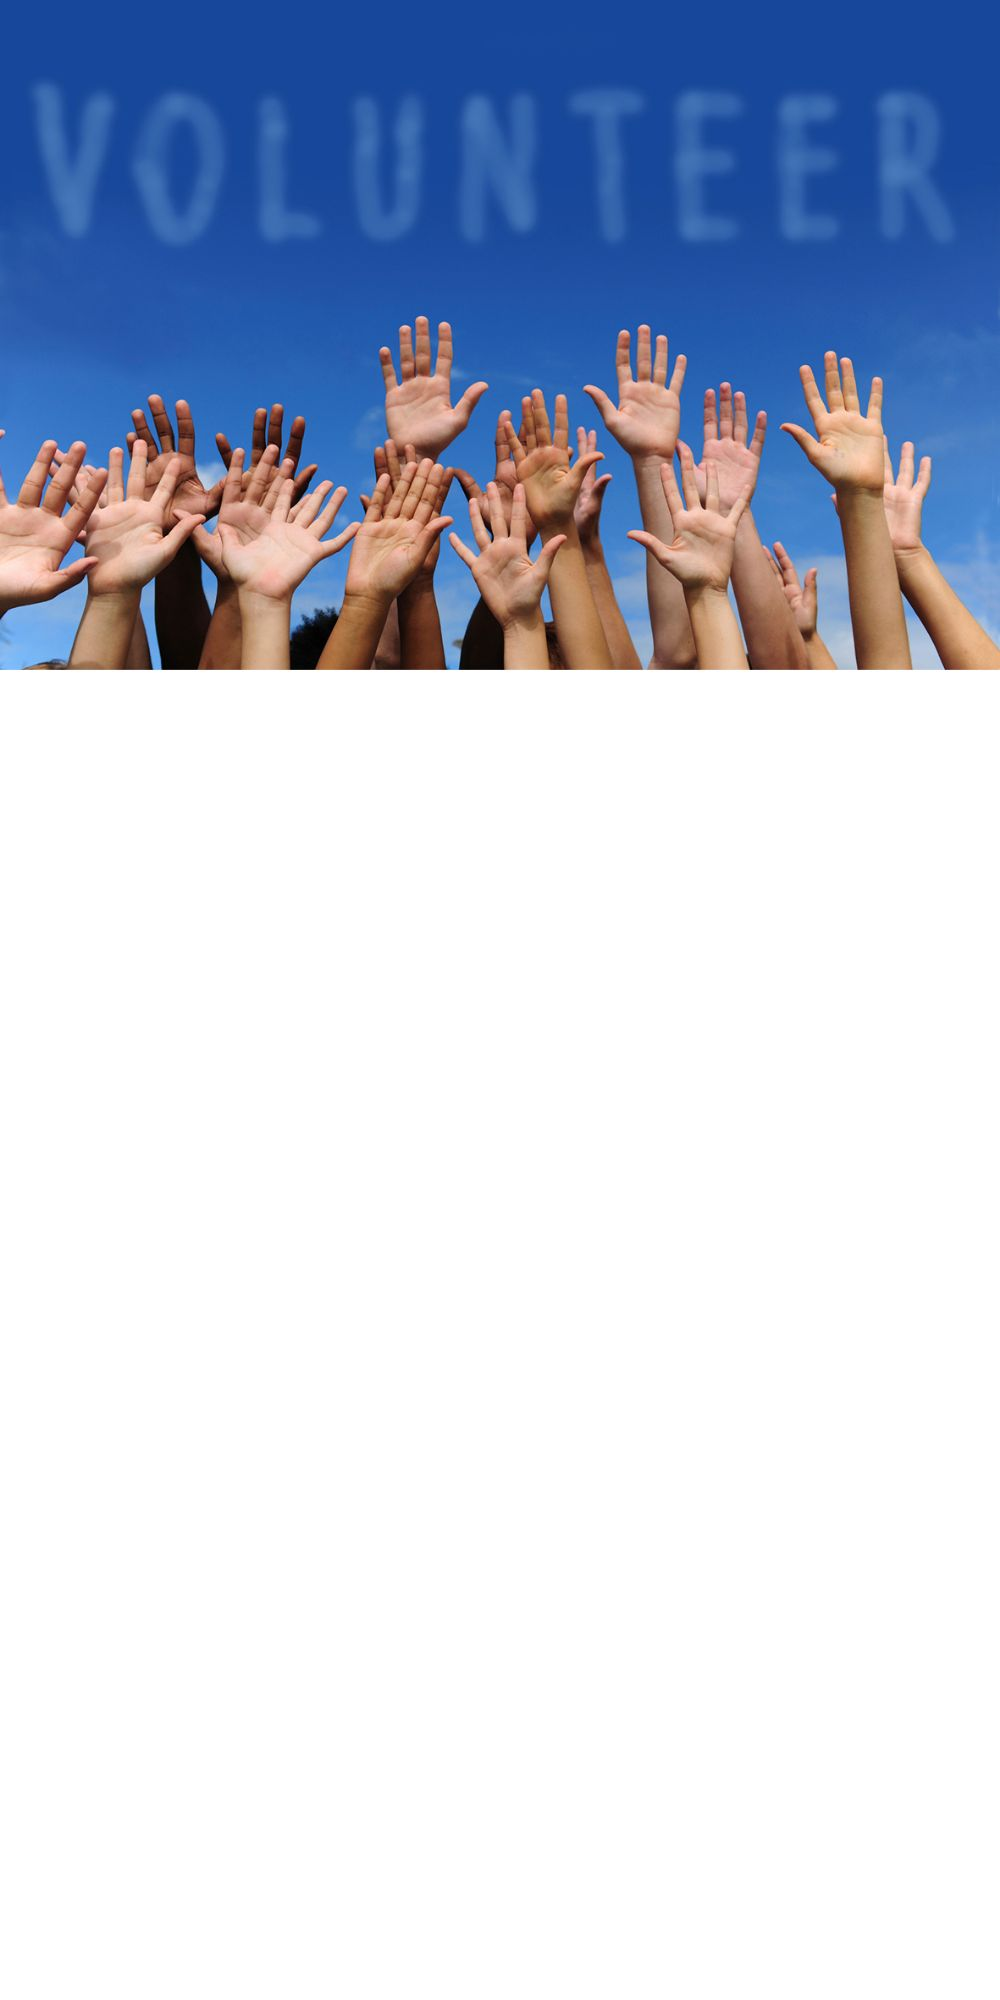 Guide to Volunteering